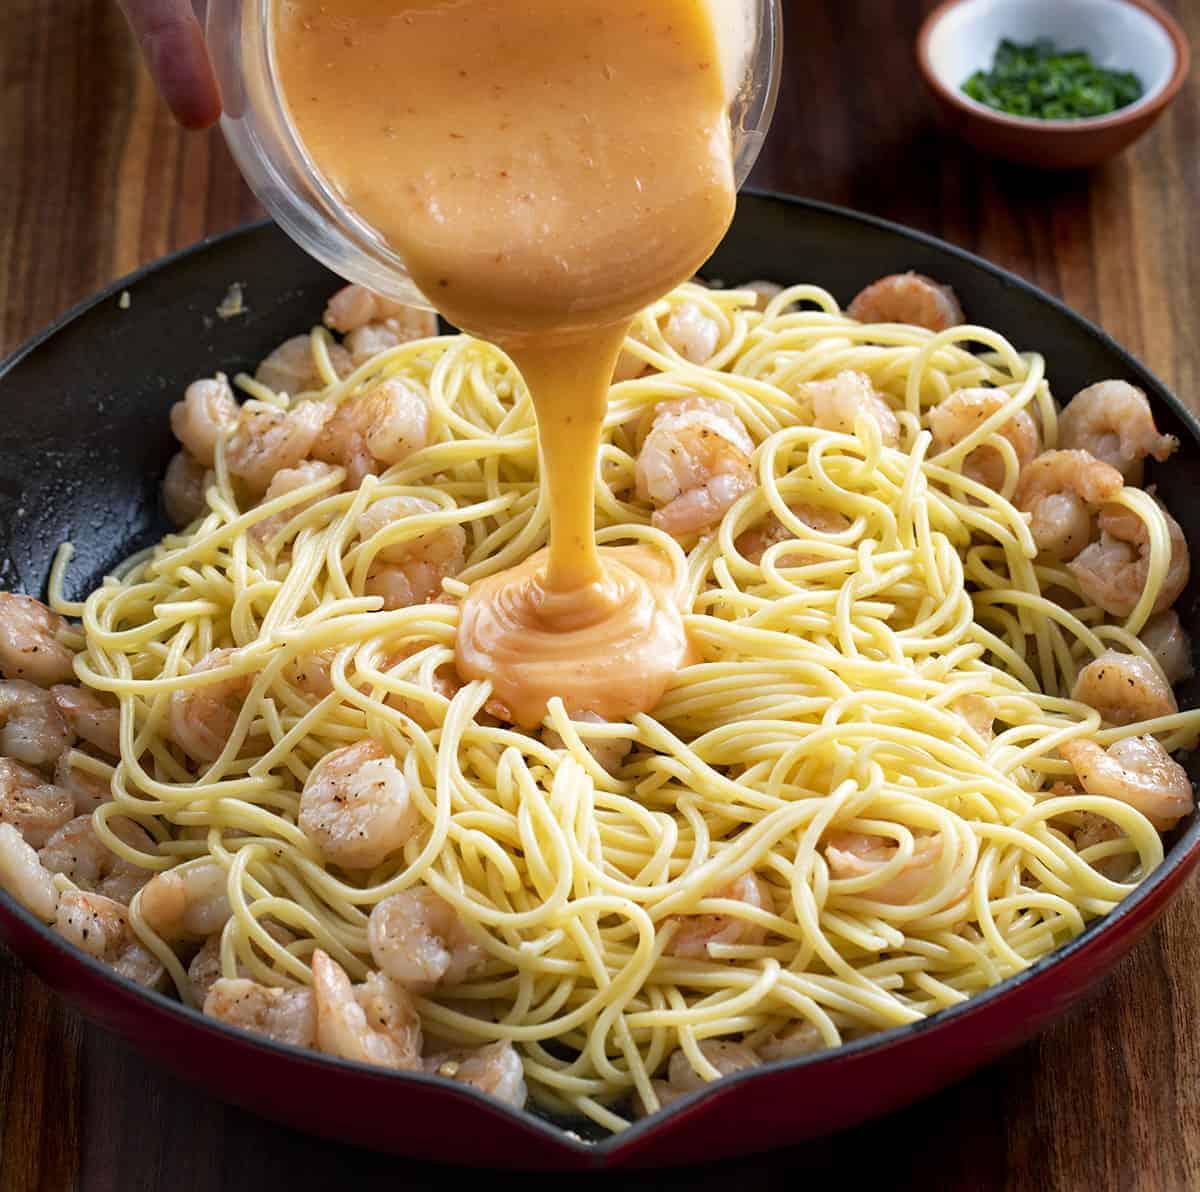 Pouring Sauce on Bang Bang Shrimp Pasta Recipe